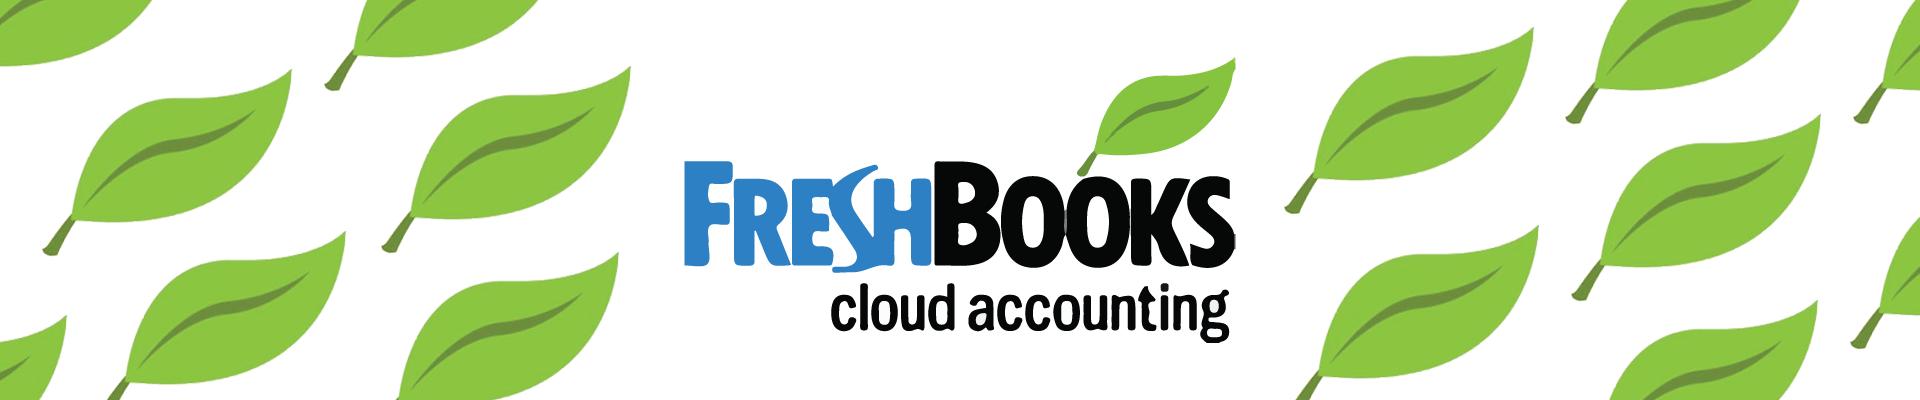 FreshBooks API Announcement